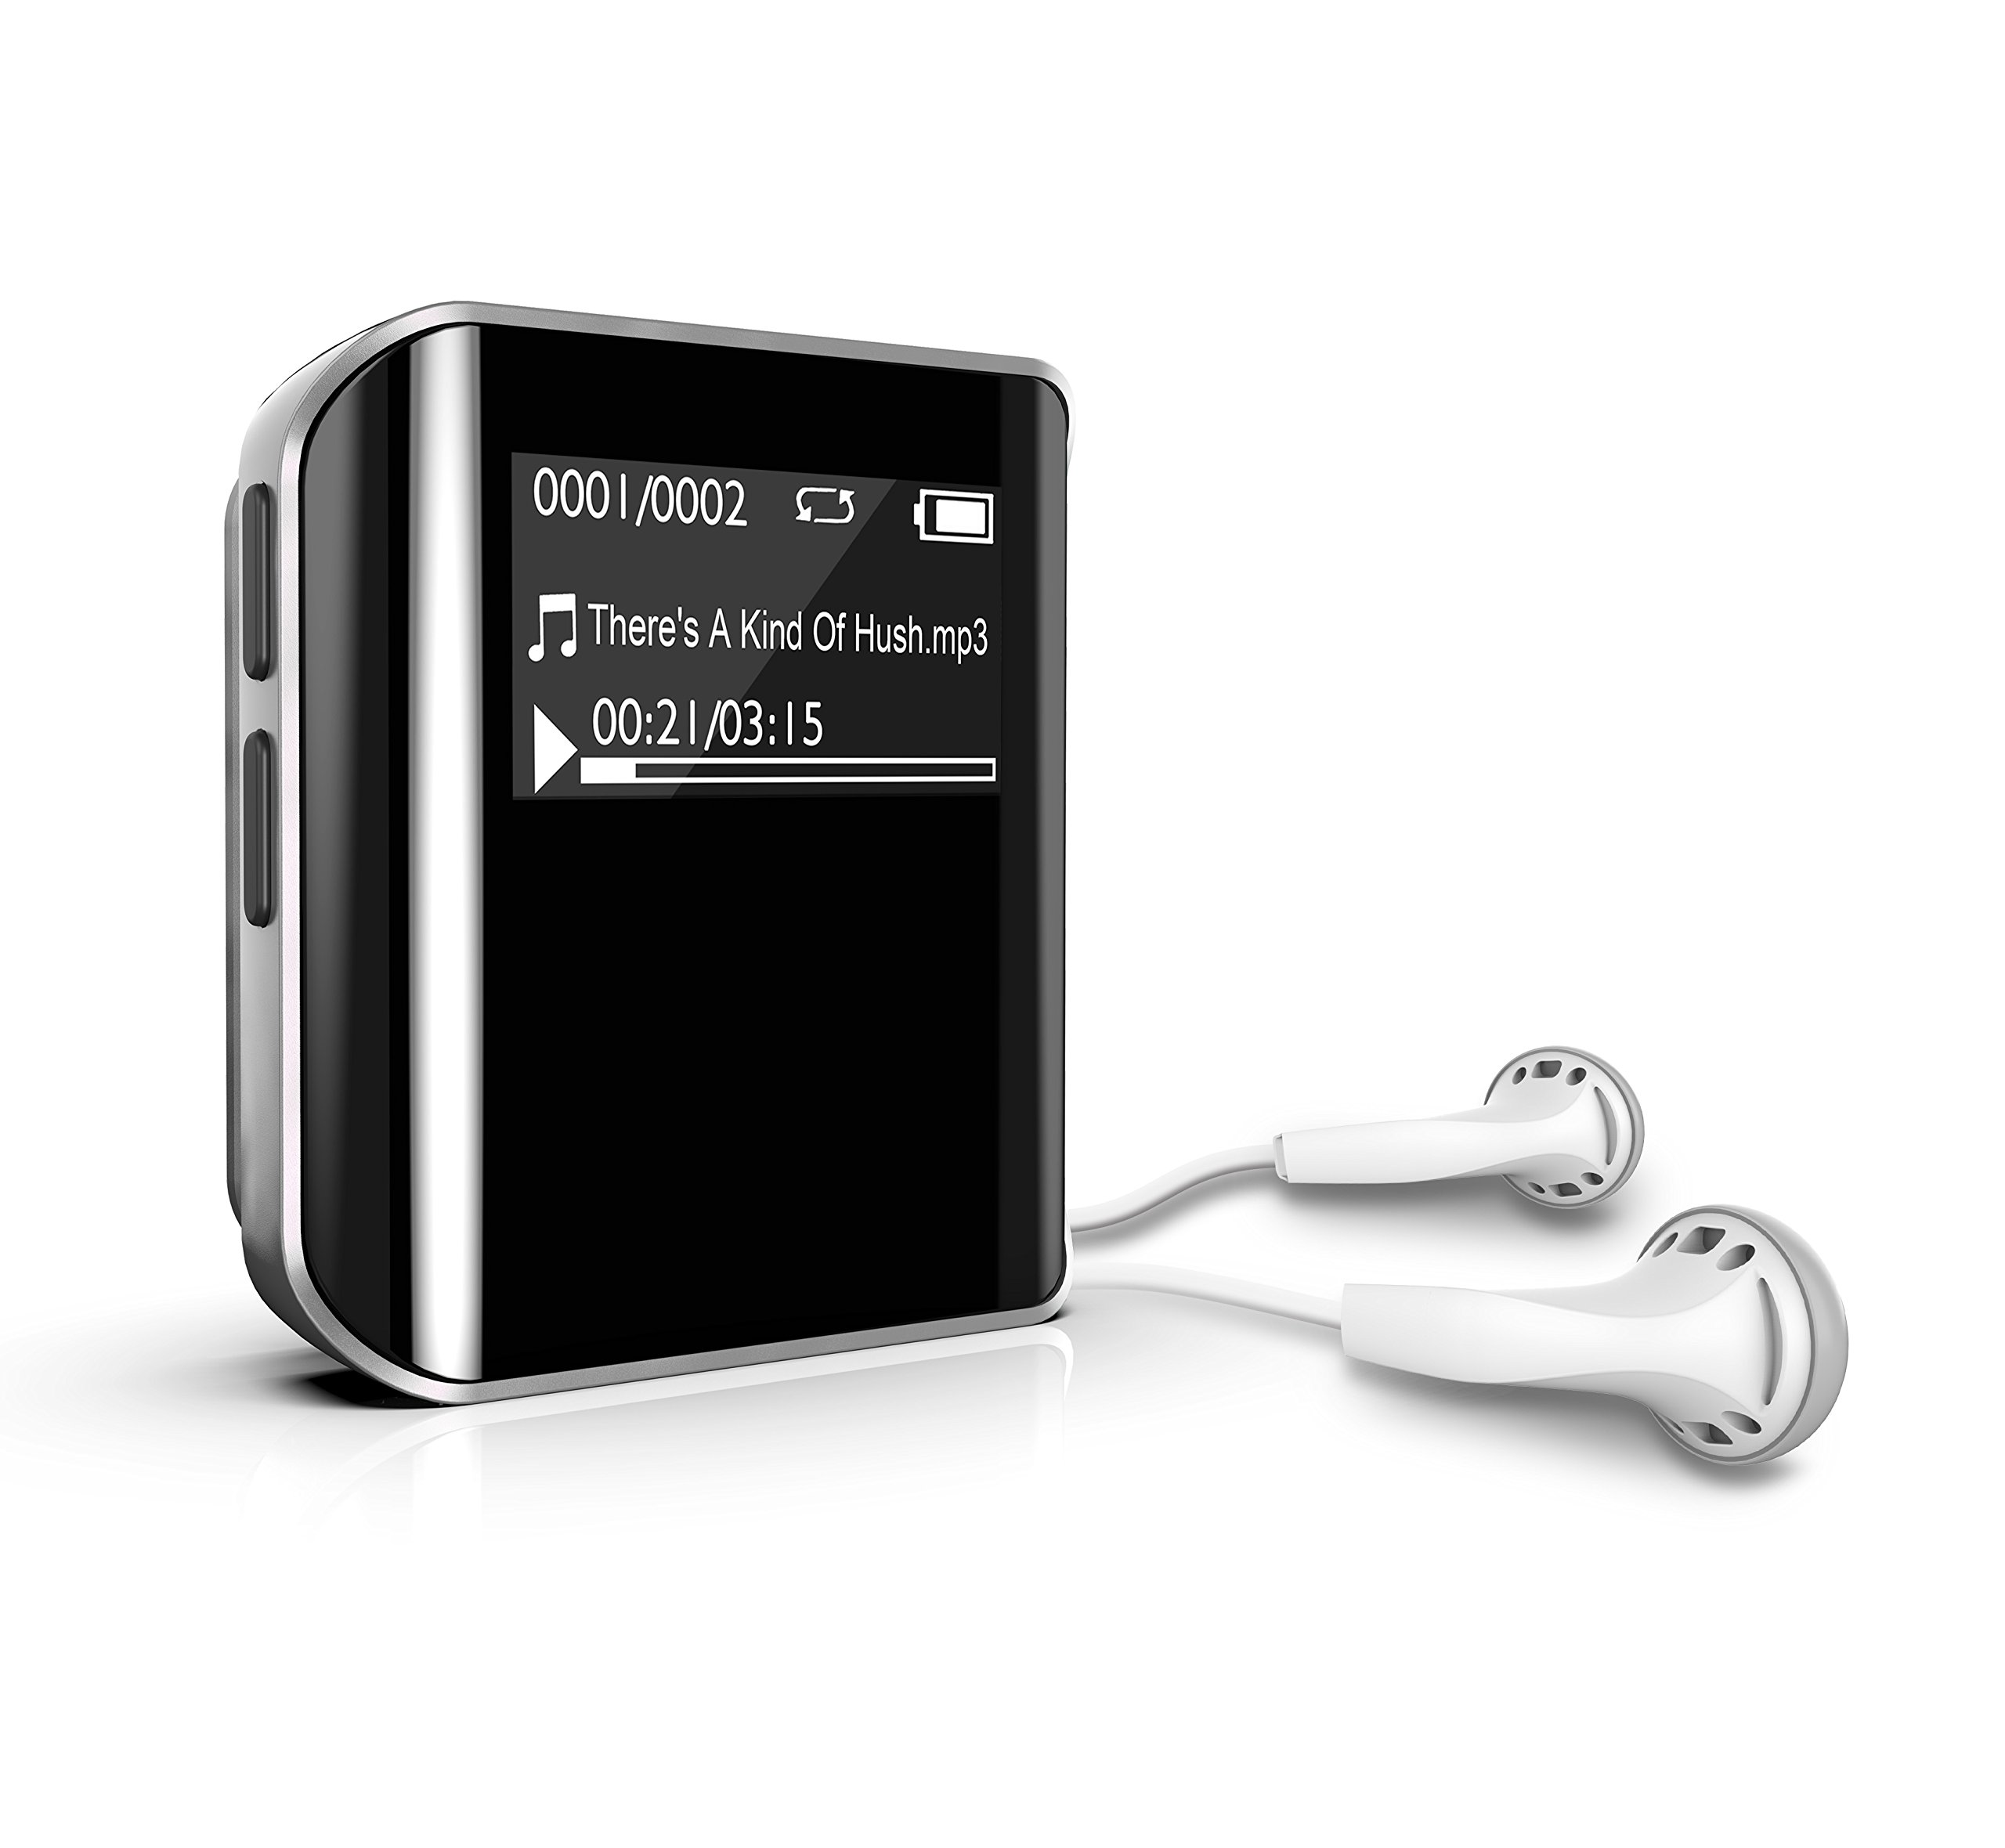 MP3 Music Player, Dansrue Mini Sport Clip Hi-Fi Sound Music Player with FM Radio Voice Recorder and E-Book, Built-in 8GB Memory, Sliver